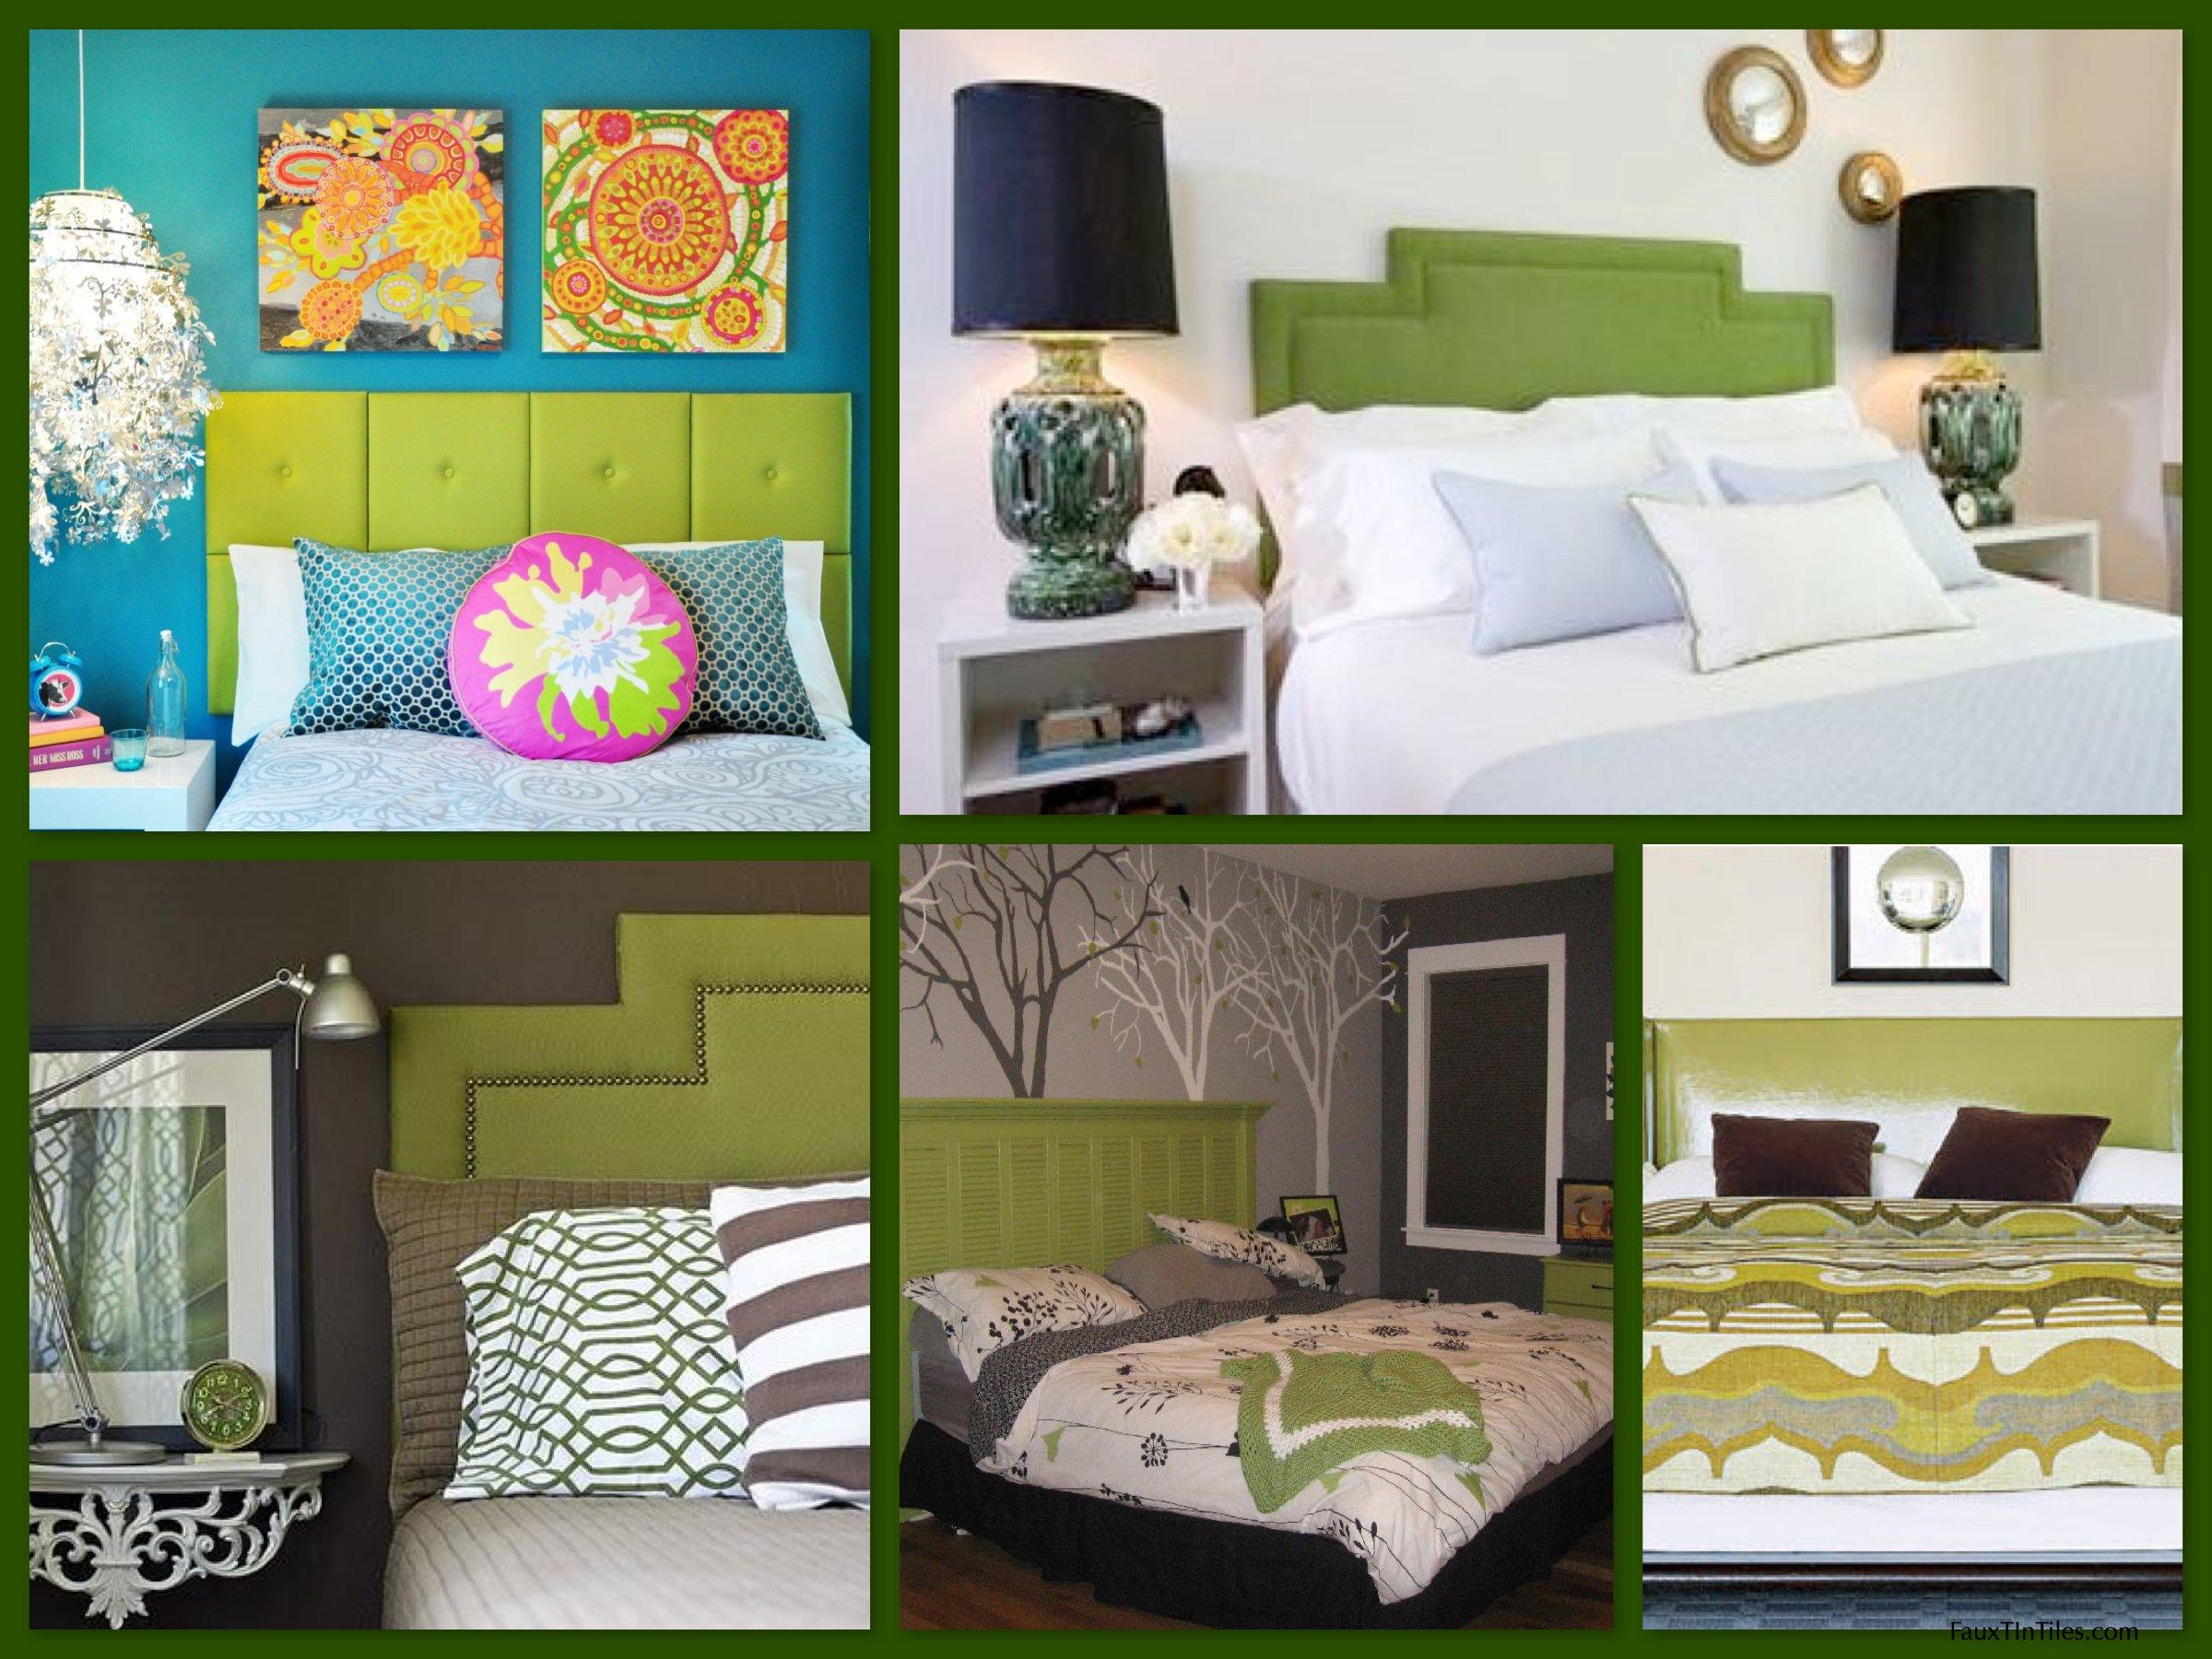 Green Ceiling Tile Ideas Decorative Ceiling Tiles